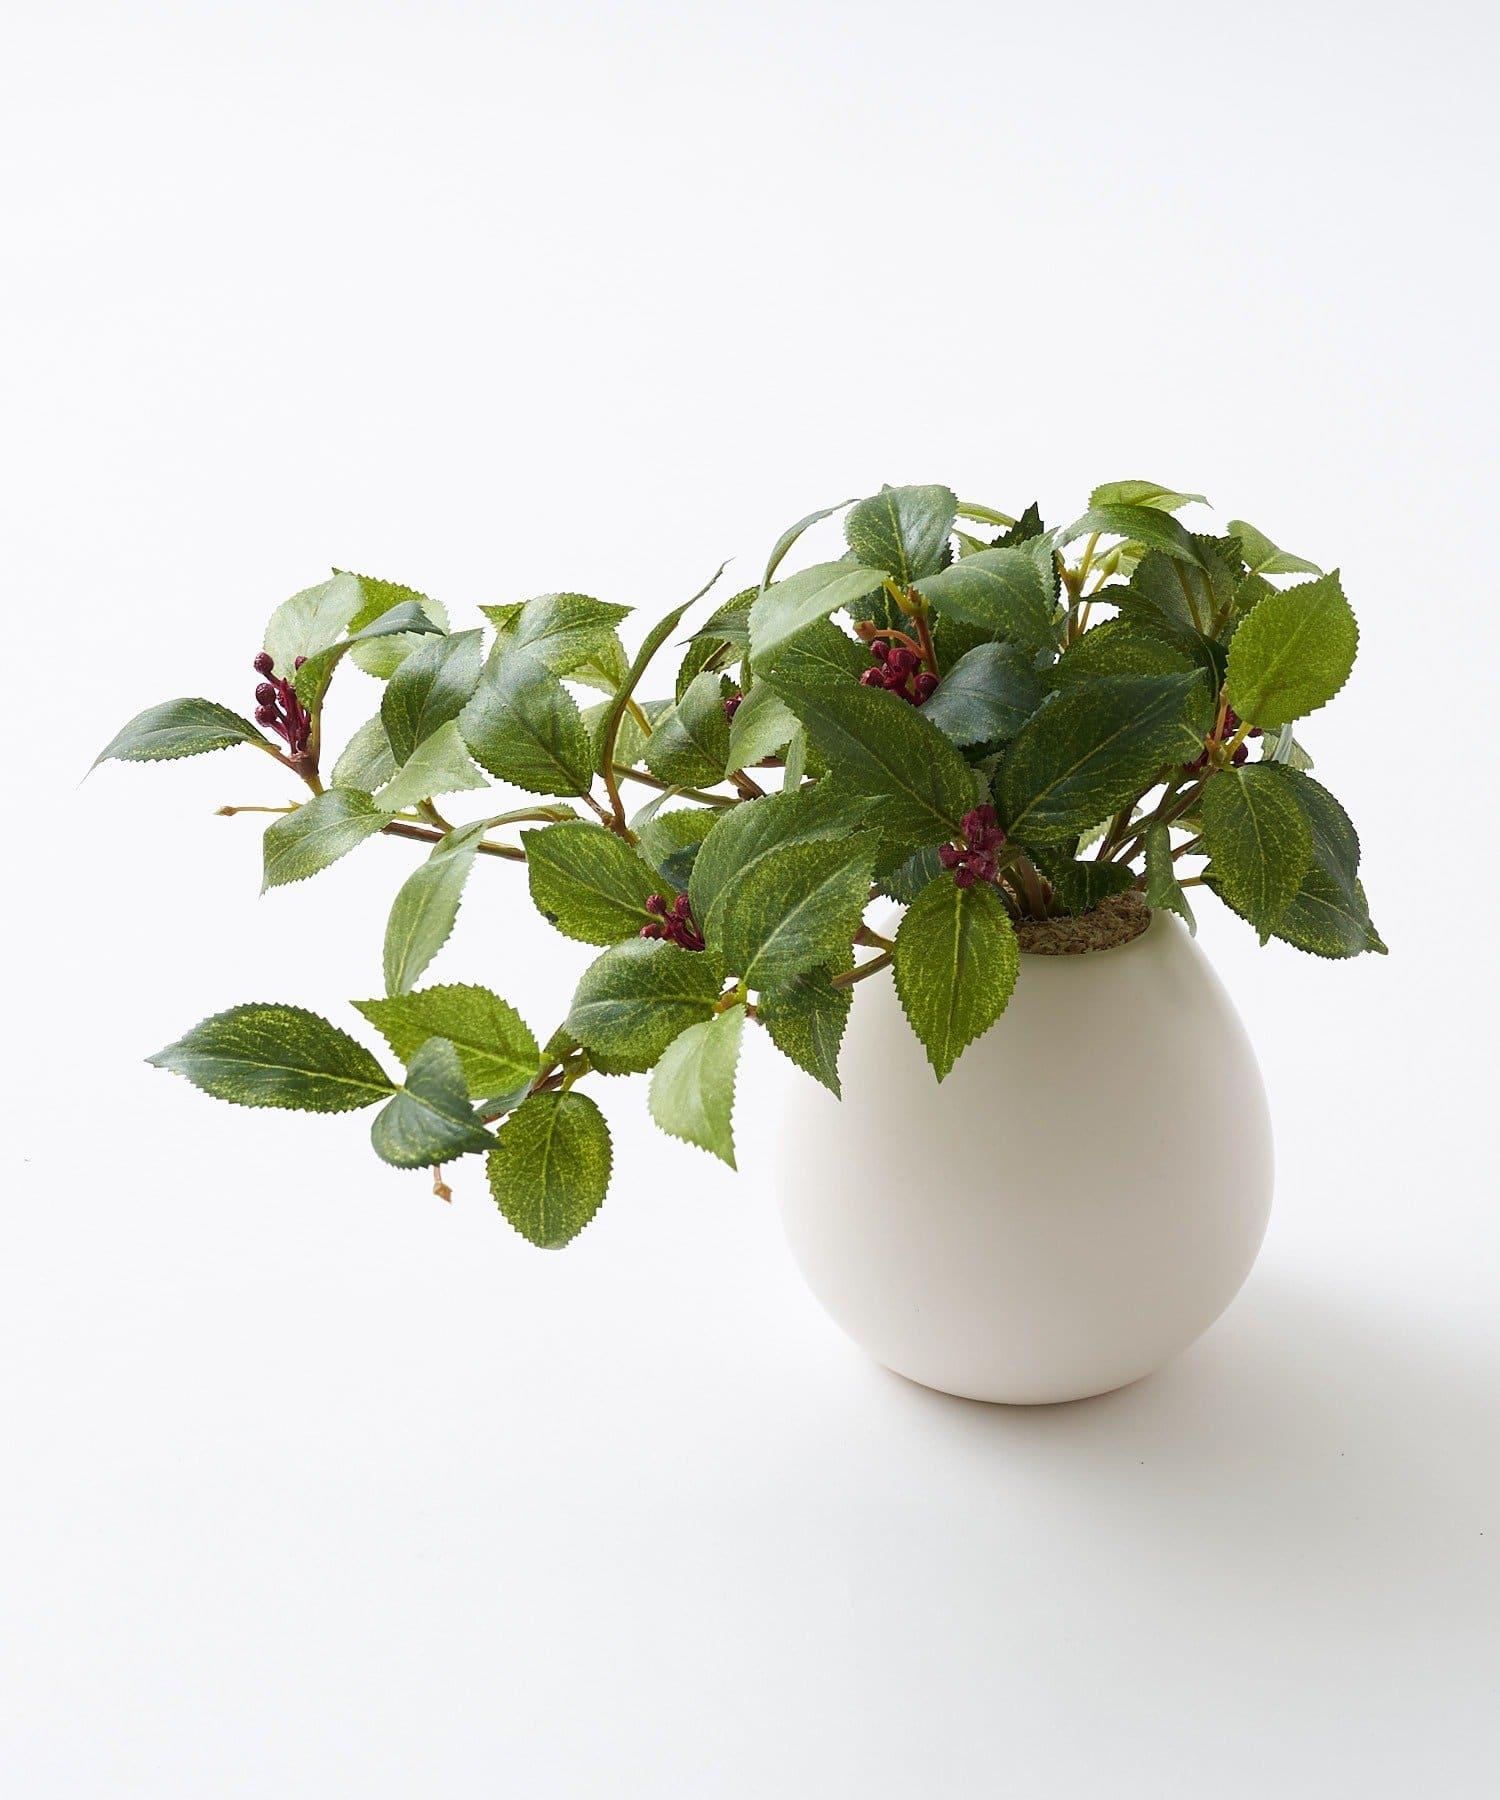 CIAOPANIC TYPY(チャオパニックティピー) ライフスタイル 〈ミニ観葉植物・フェイクグリーン〉MRポット グリーンその他3